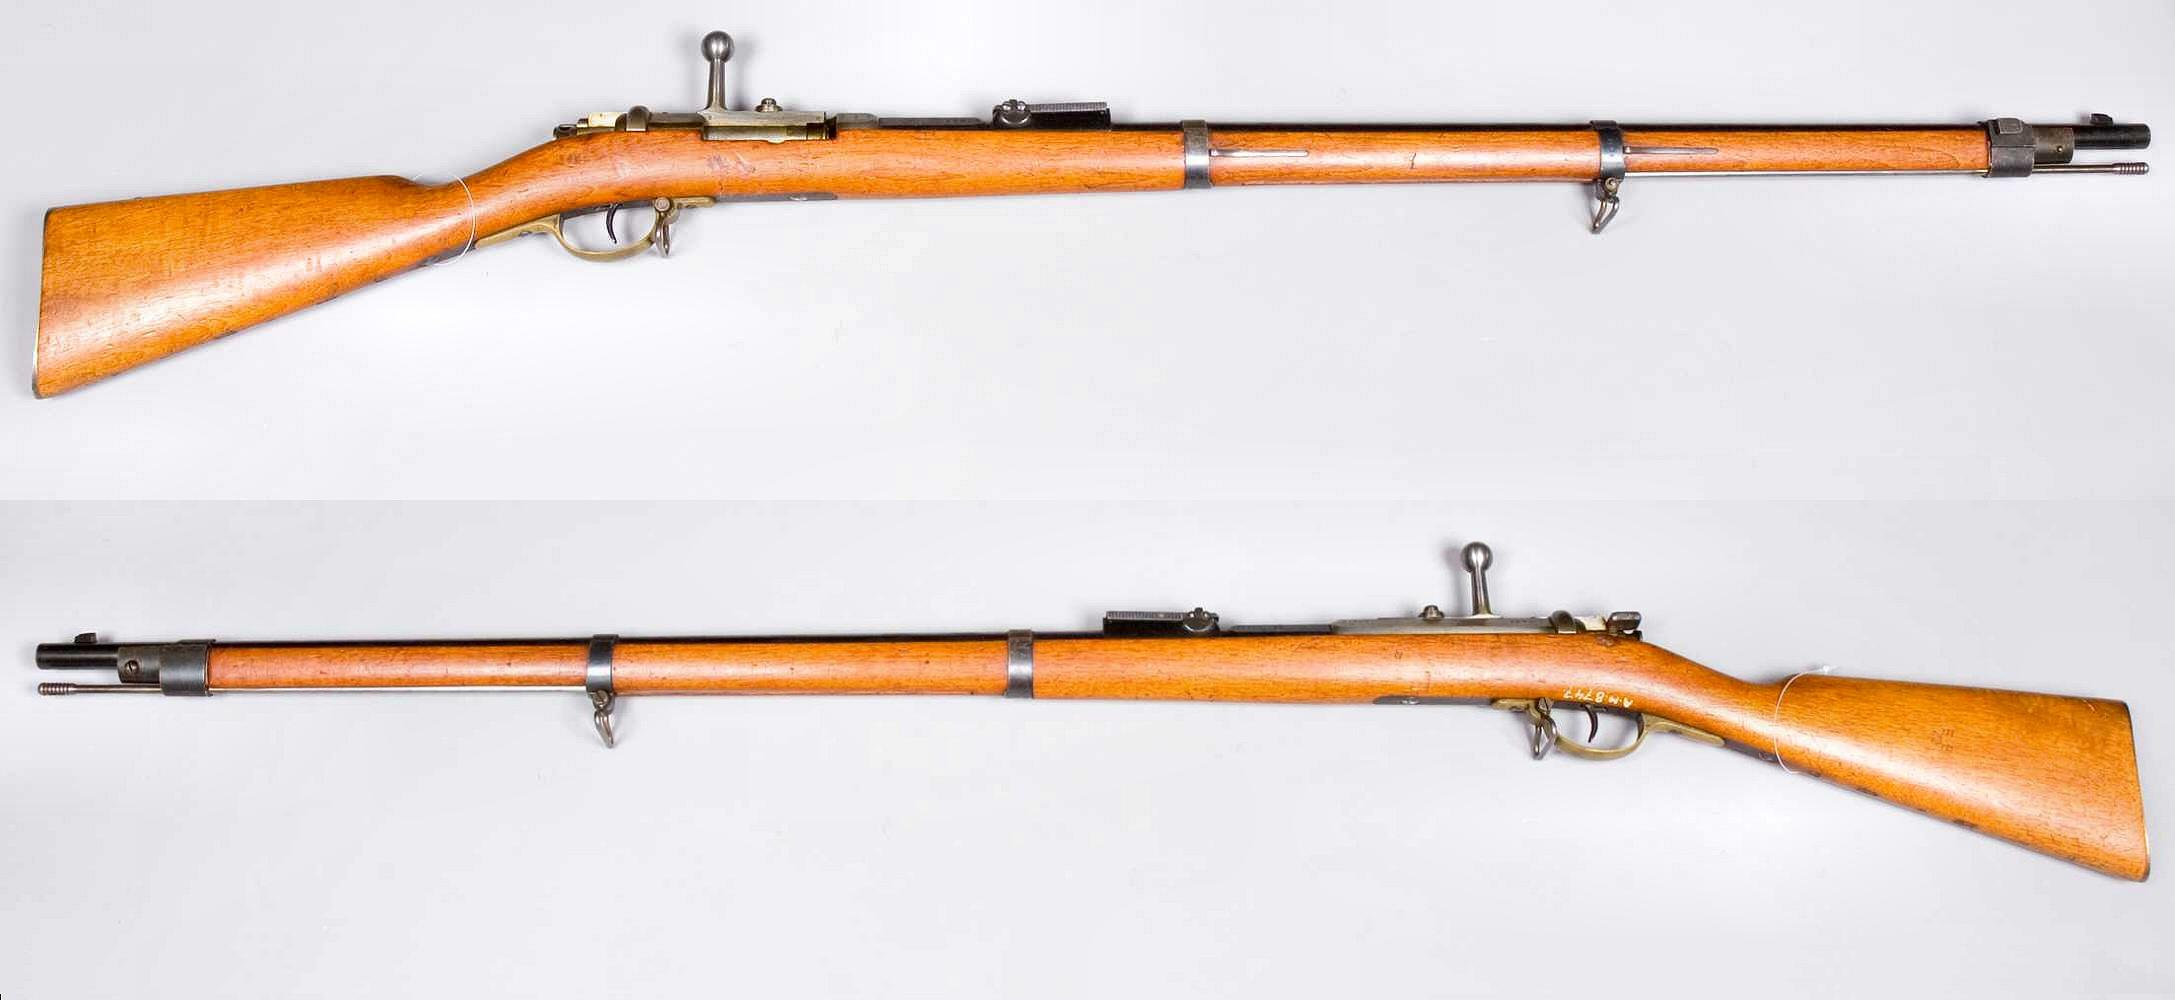 Collectibles Skillful Manufacture Sks Rear Sight Set Simonov Rifle.the Original Soviet Union